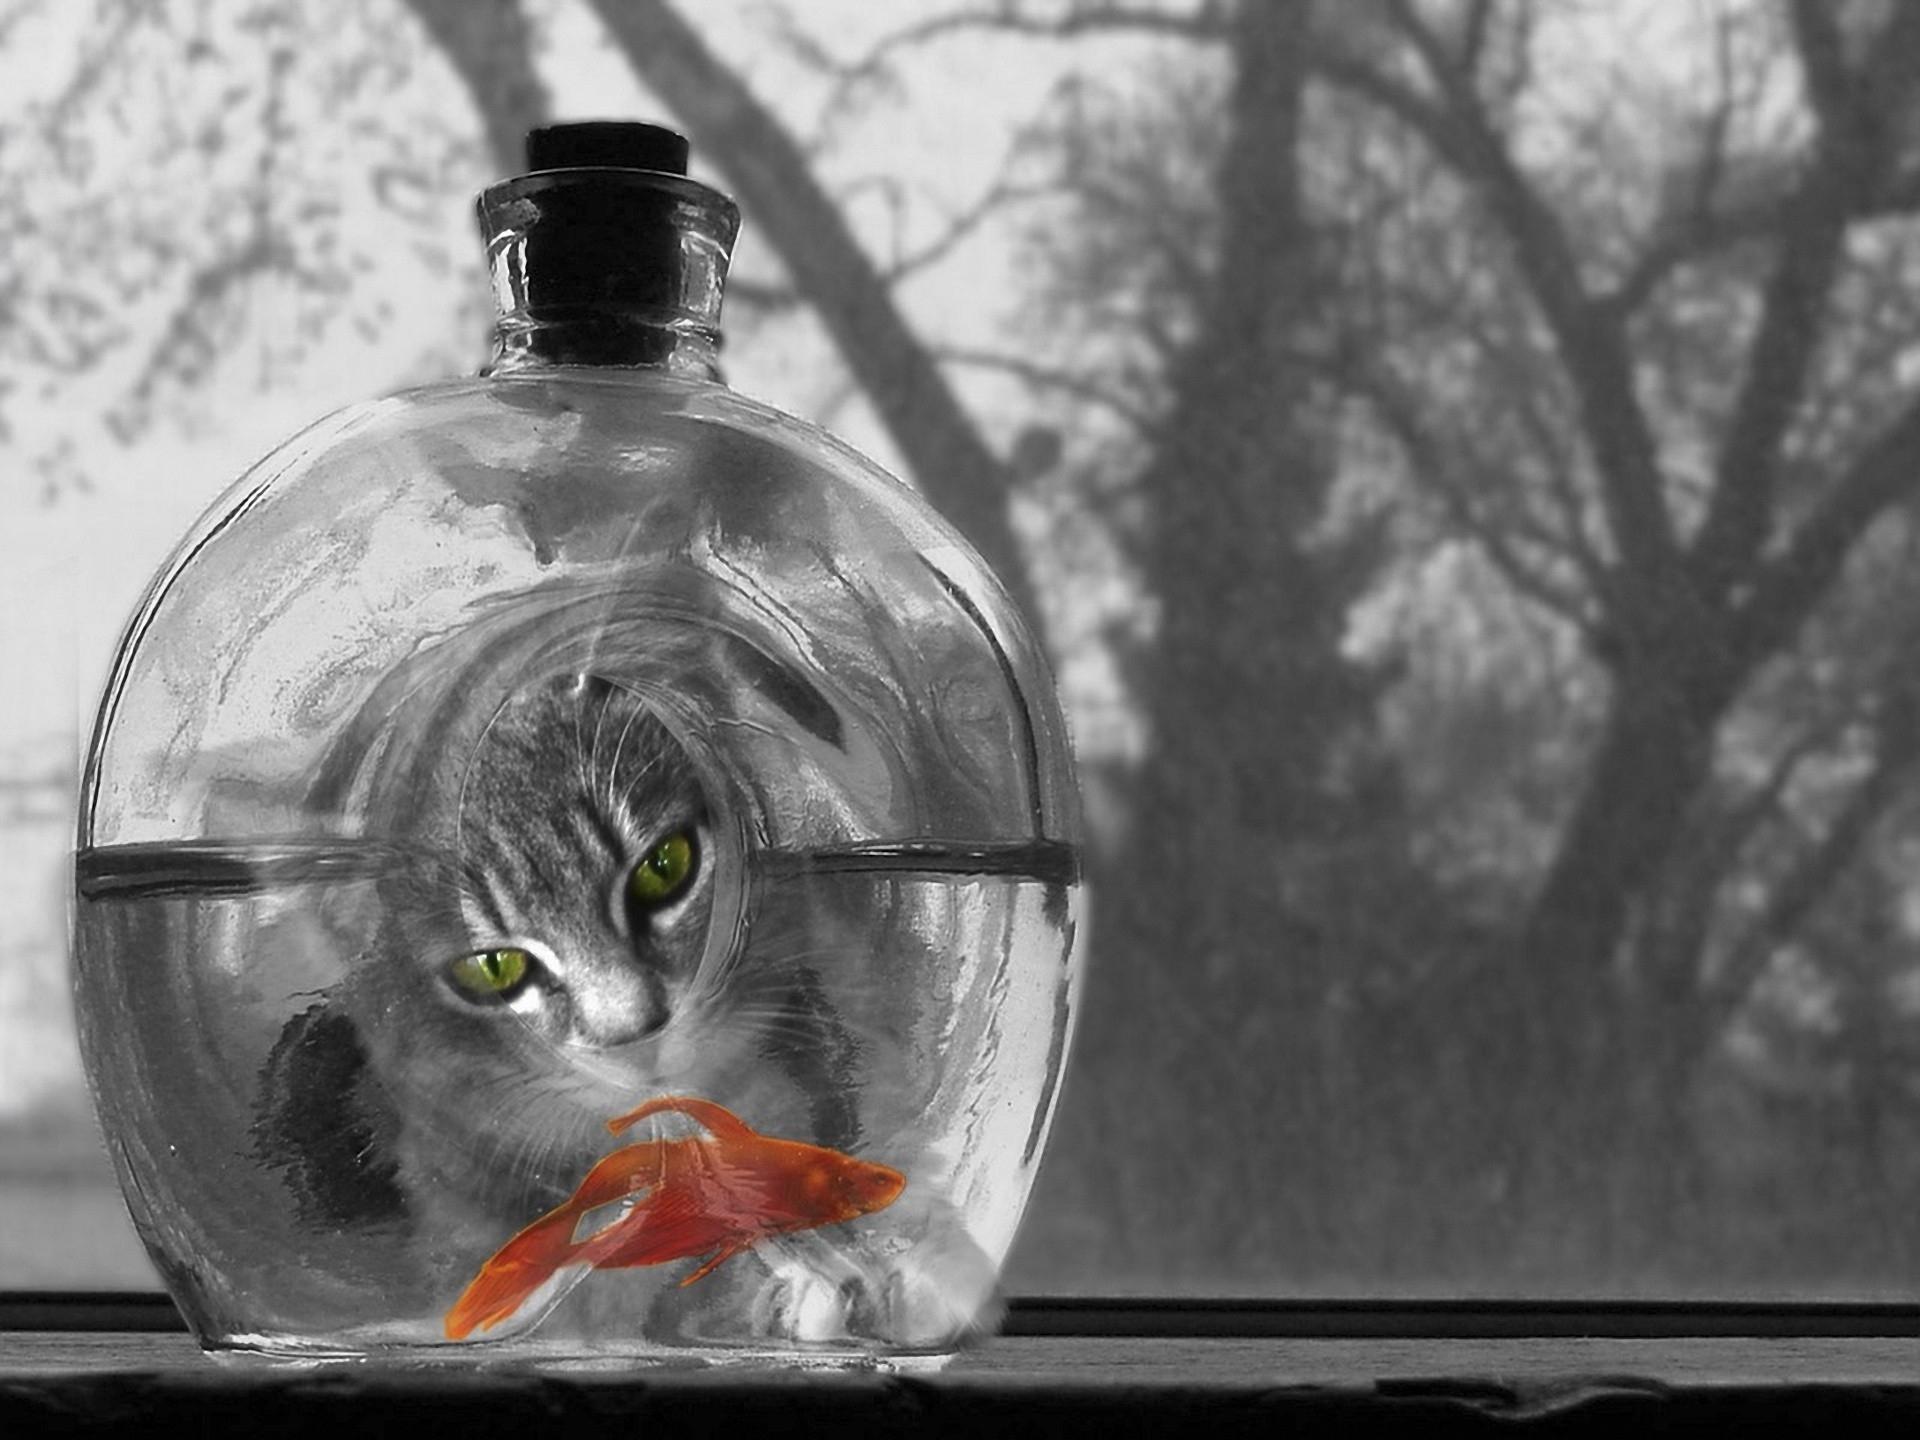 Selective color black white goldfish humor mood eyes wallpaper 1920x1440 32335 wallpaperup - Ogen grappig ...